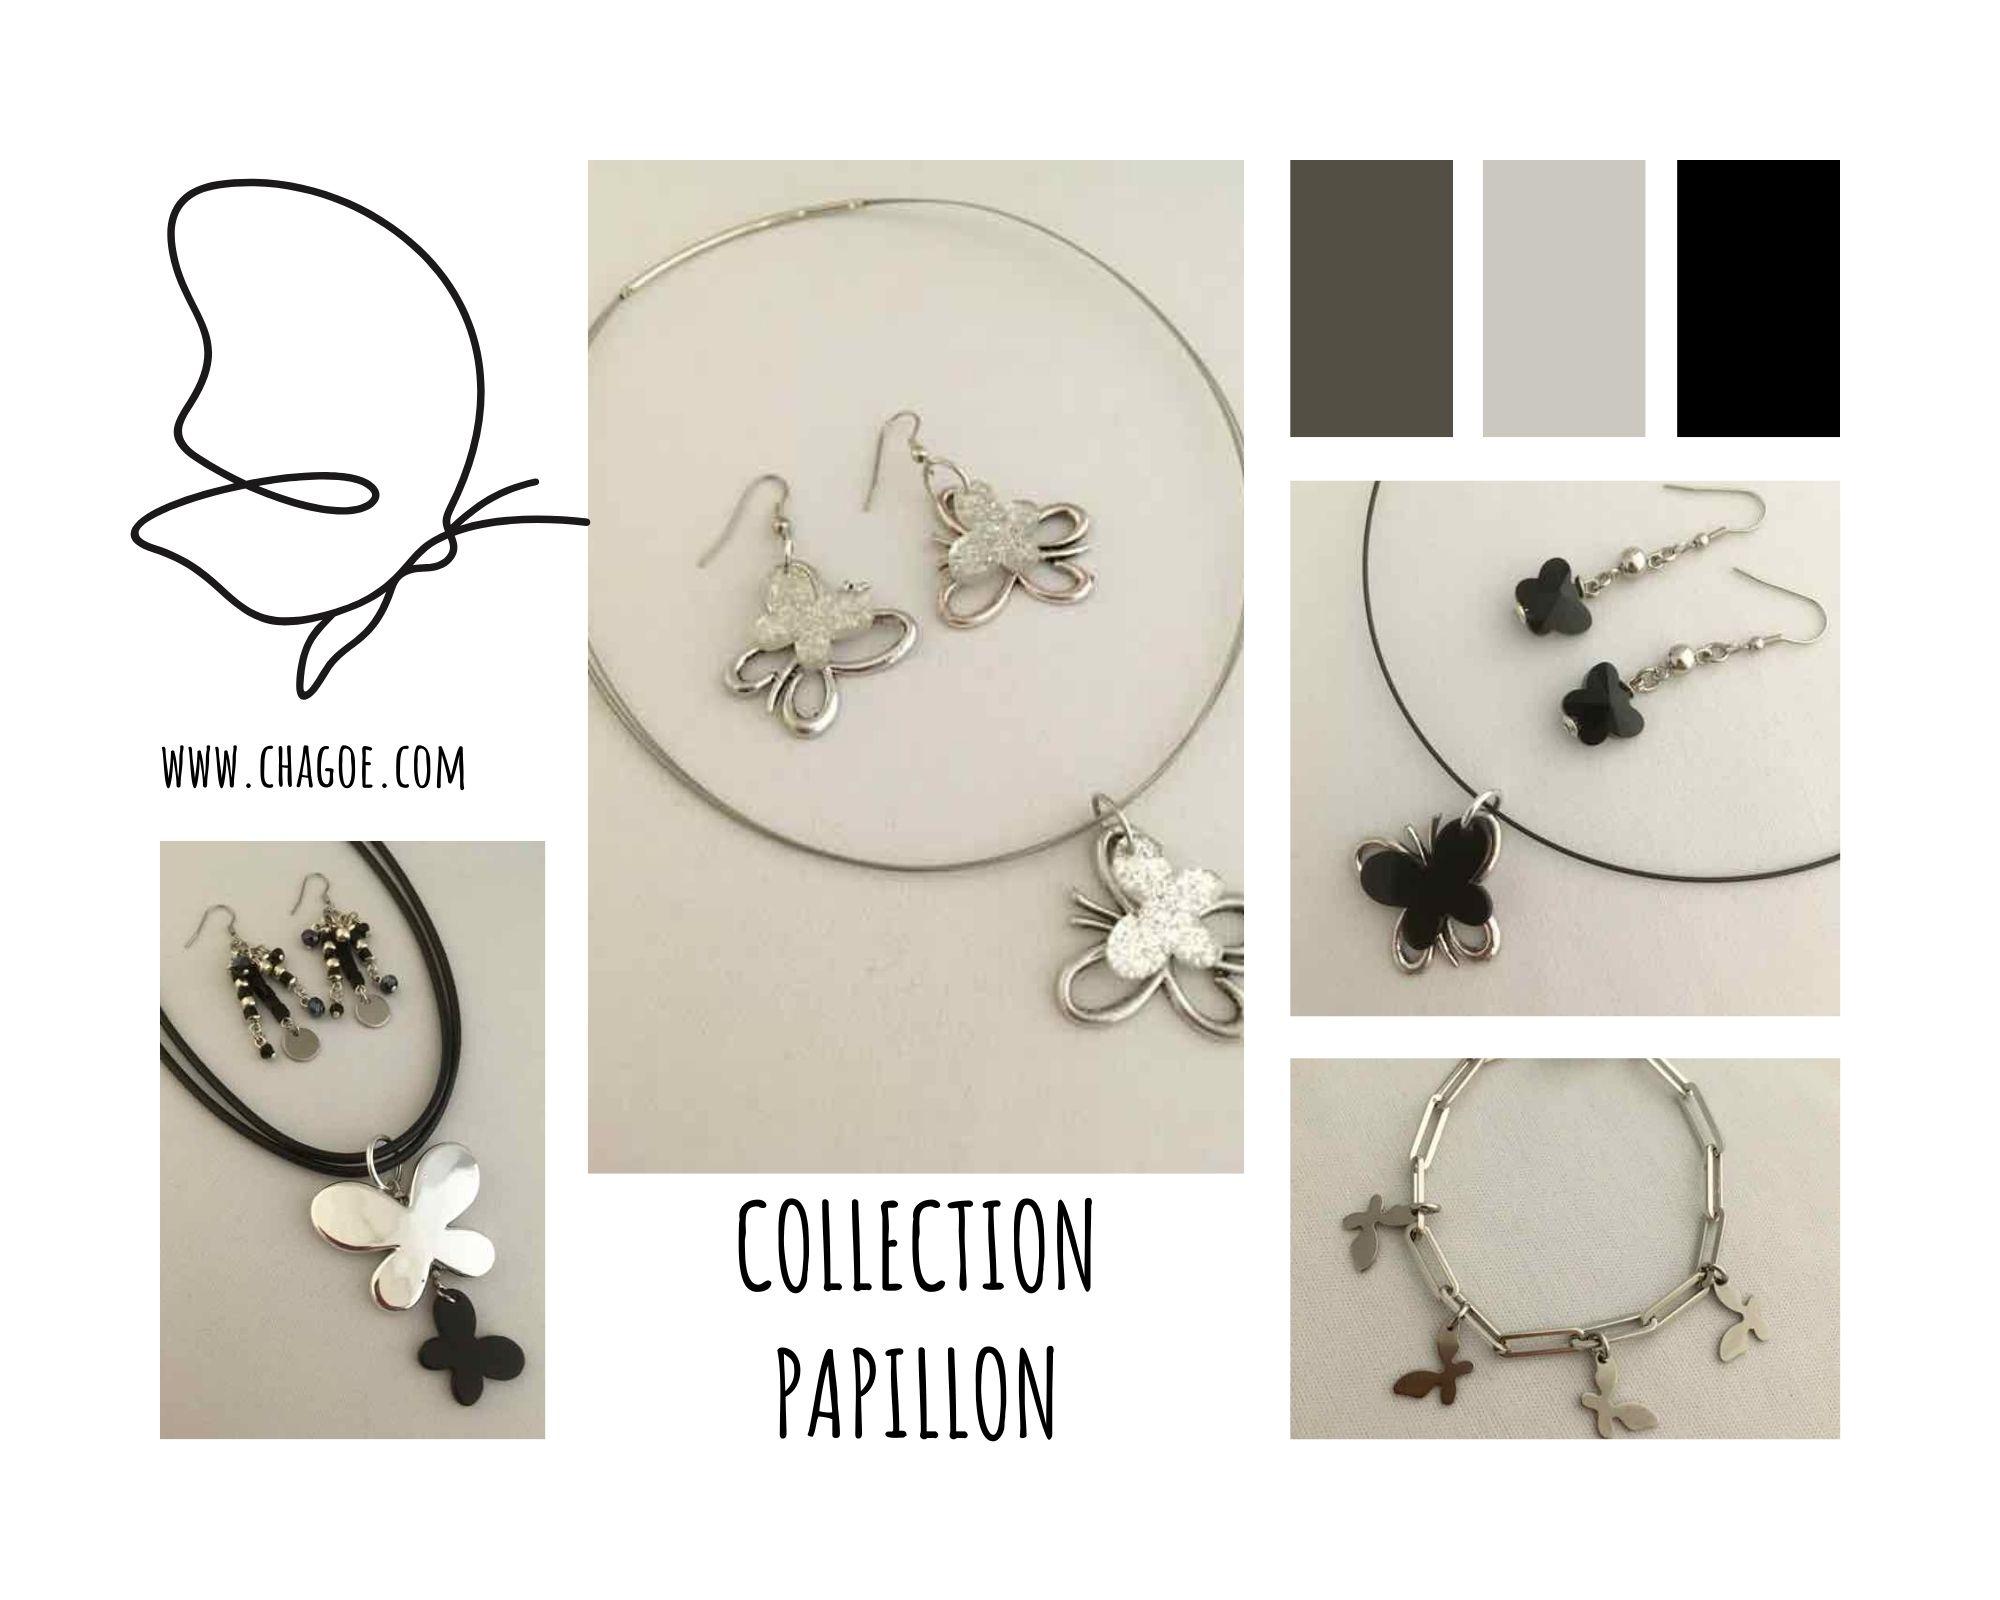 Collection PAPILLON Chagoë 2021